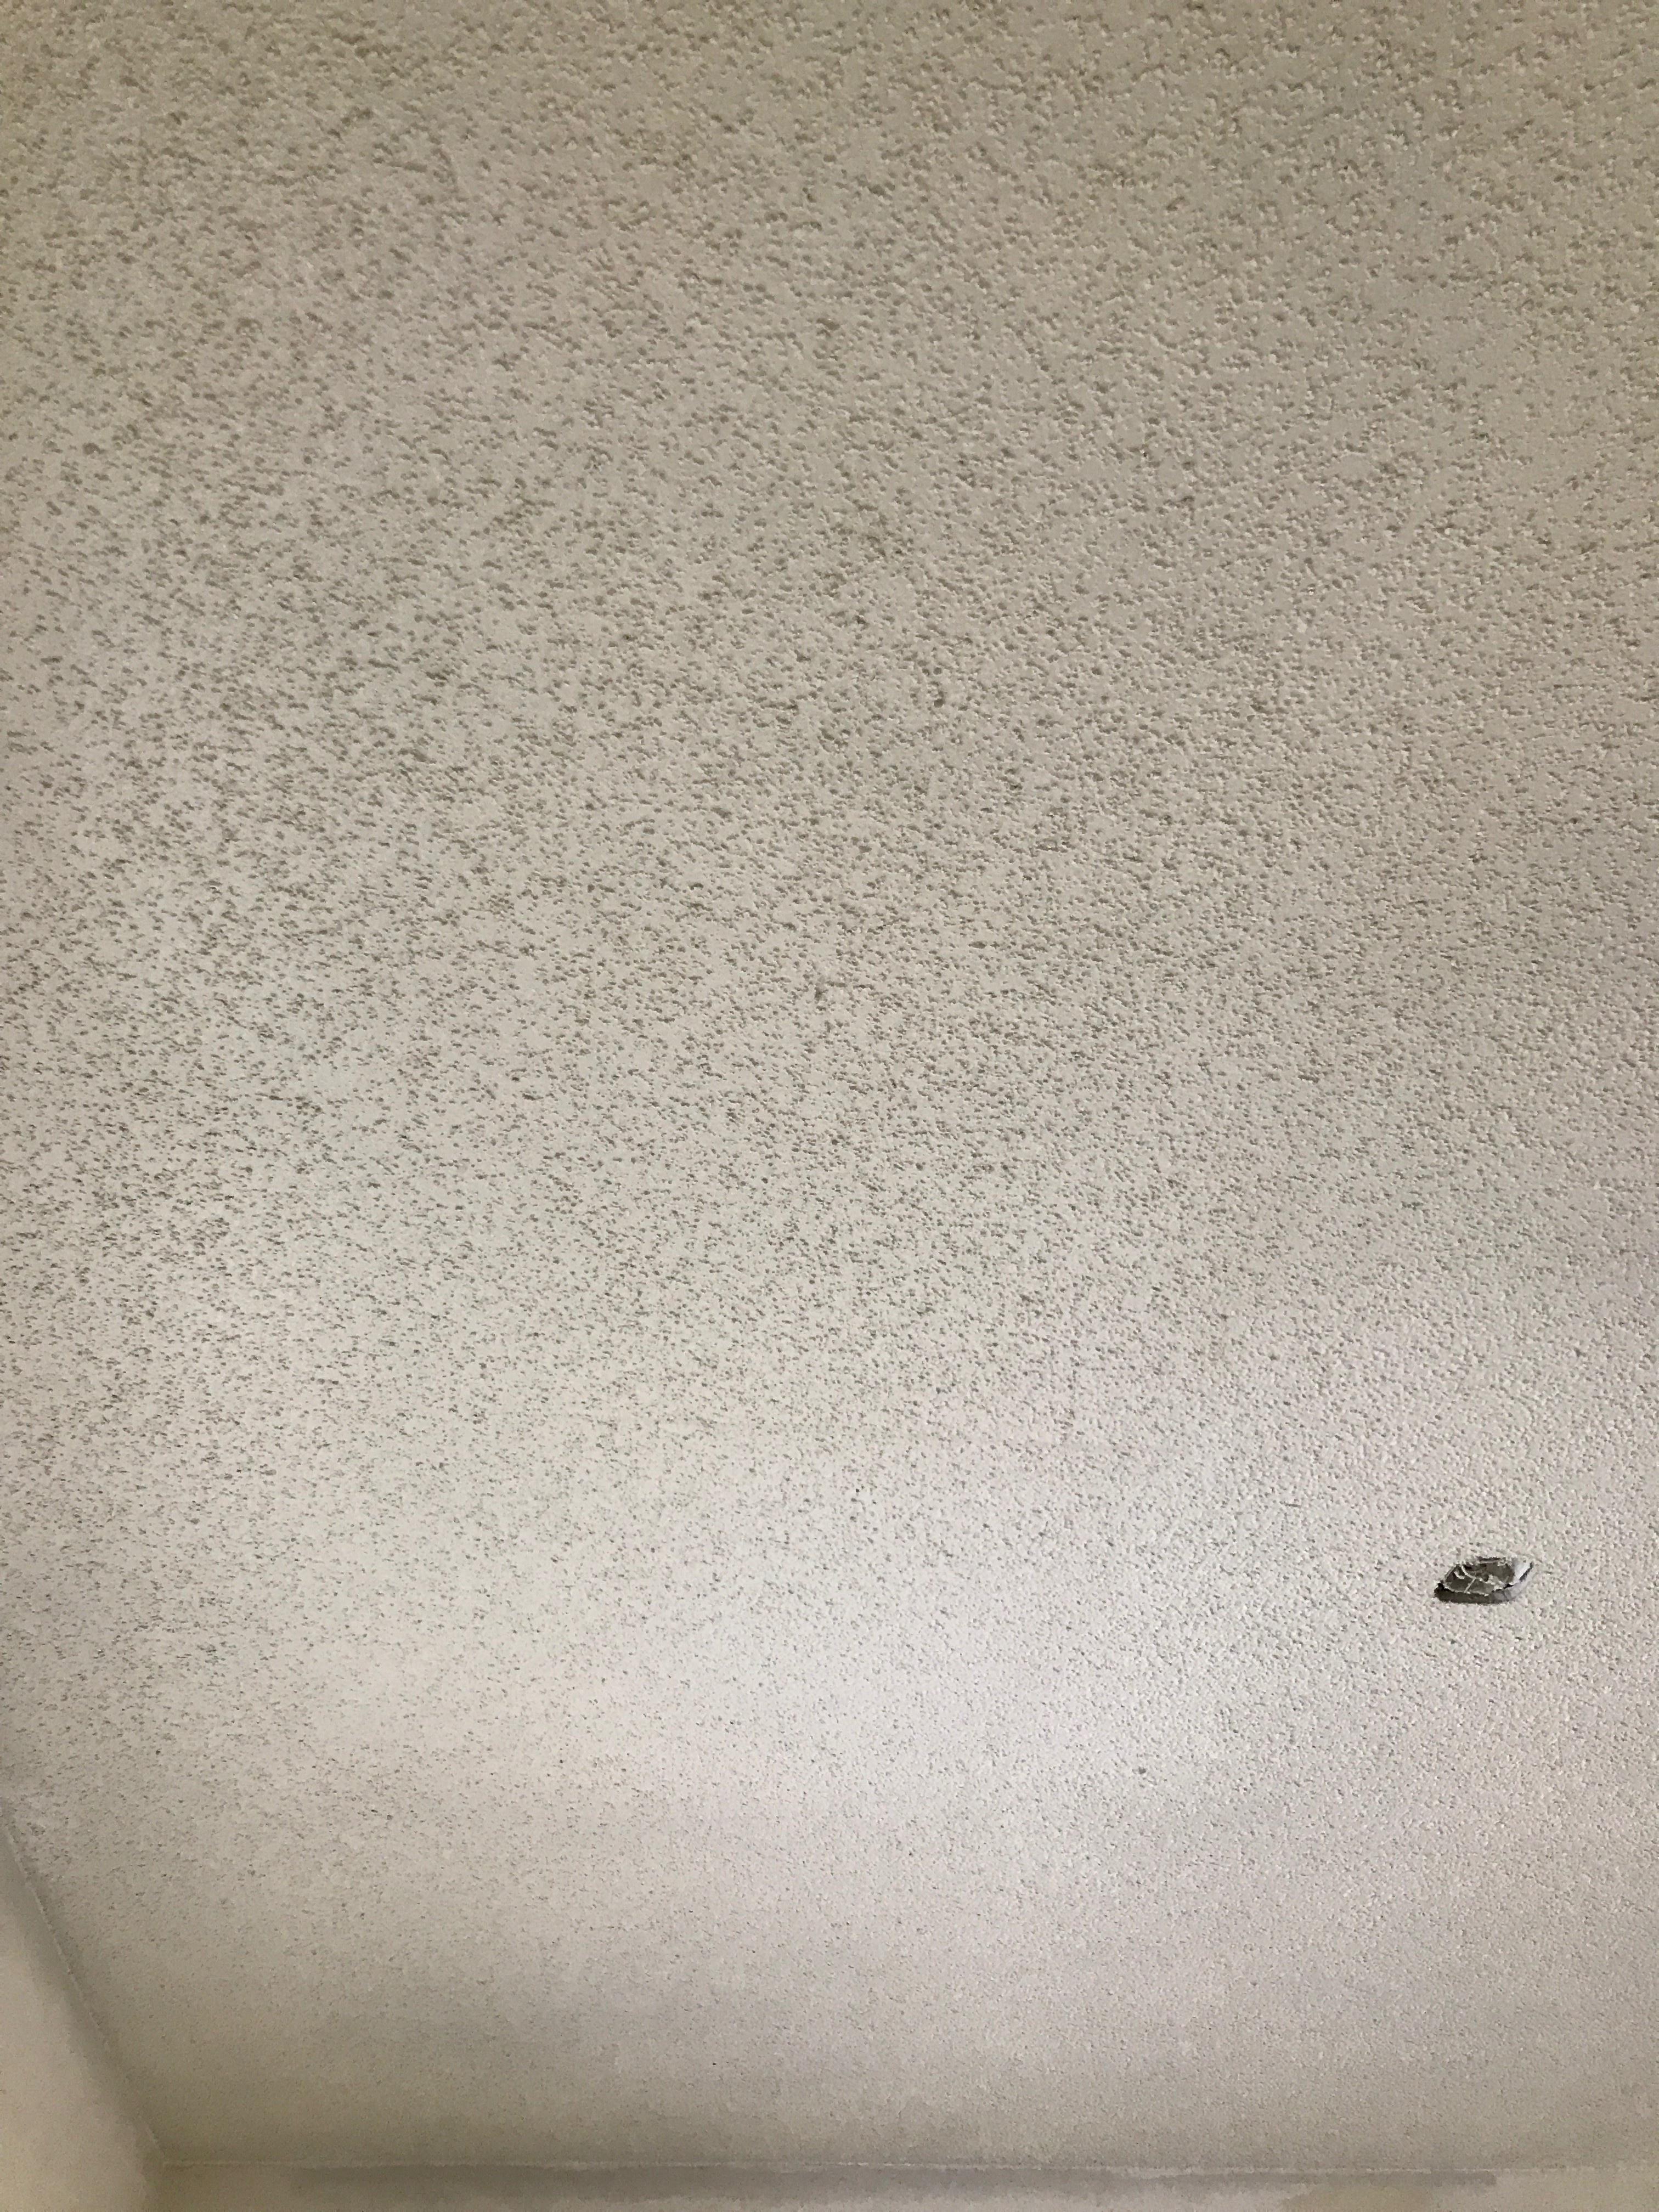 https://0201.nccdn.net/1_2/000/000/093/7e5/Ceiling-3024x4032.jpg